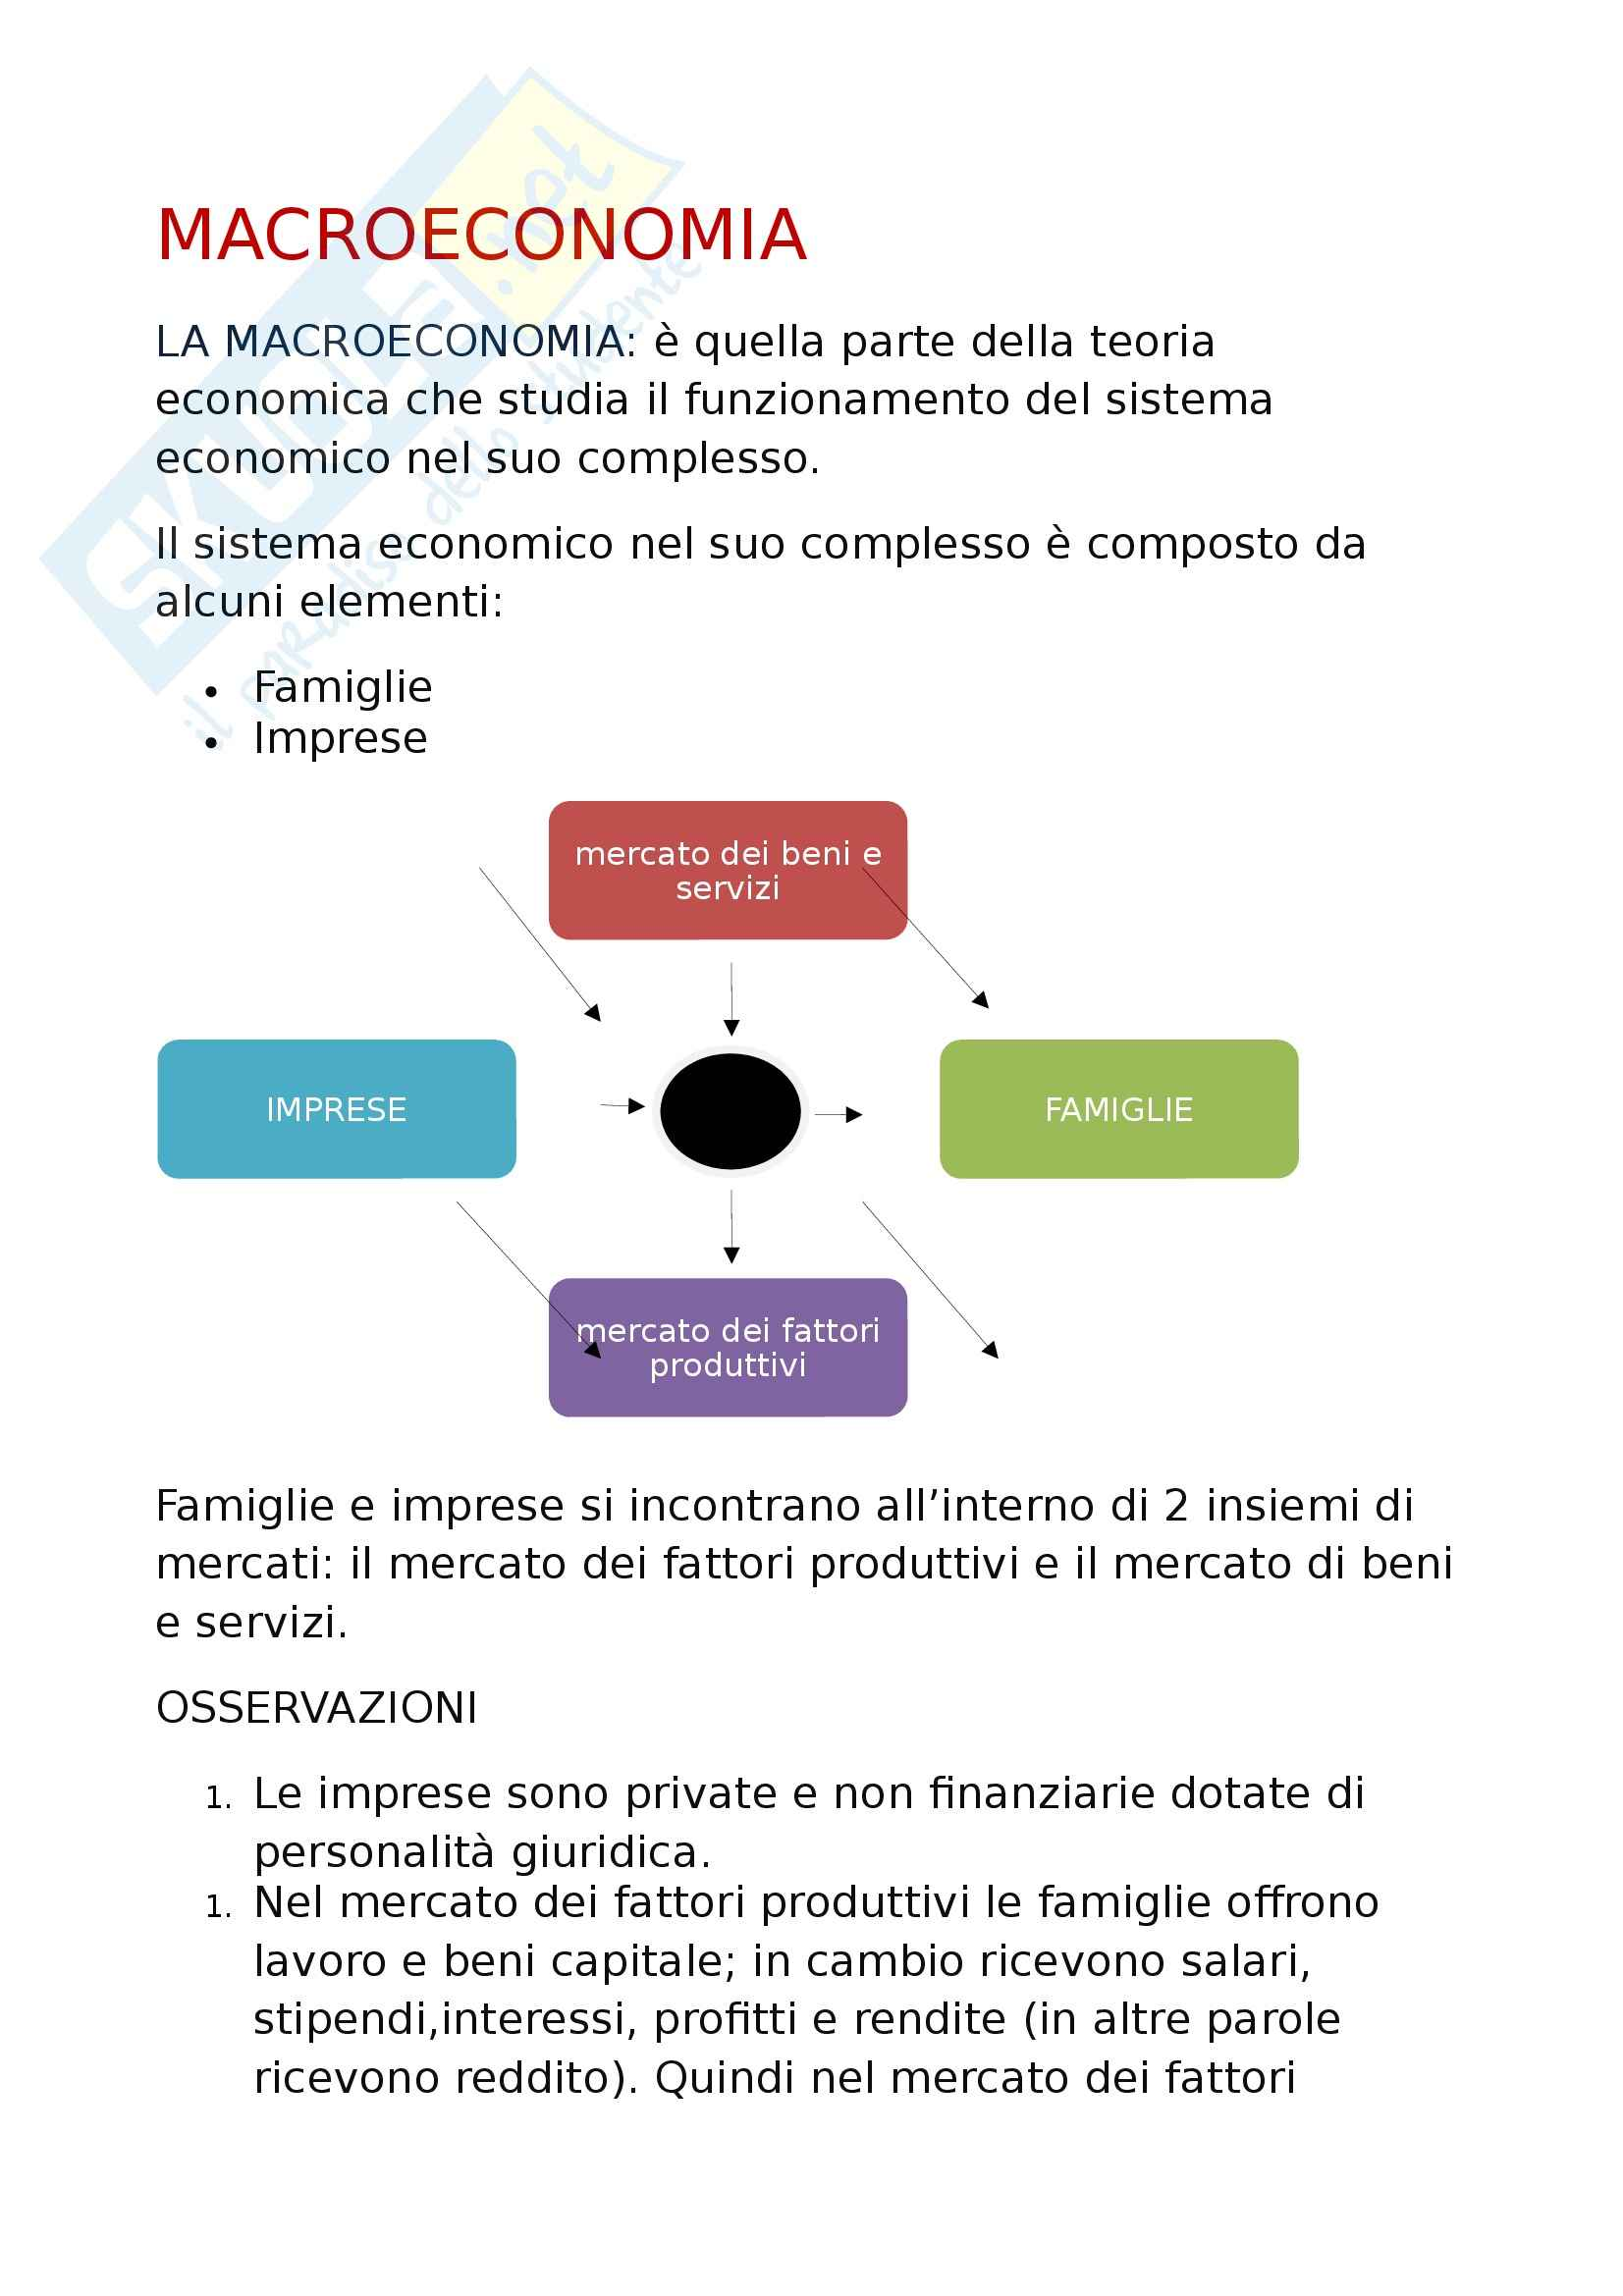 Macroeconomia - sistema economico e PIL